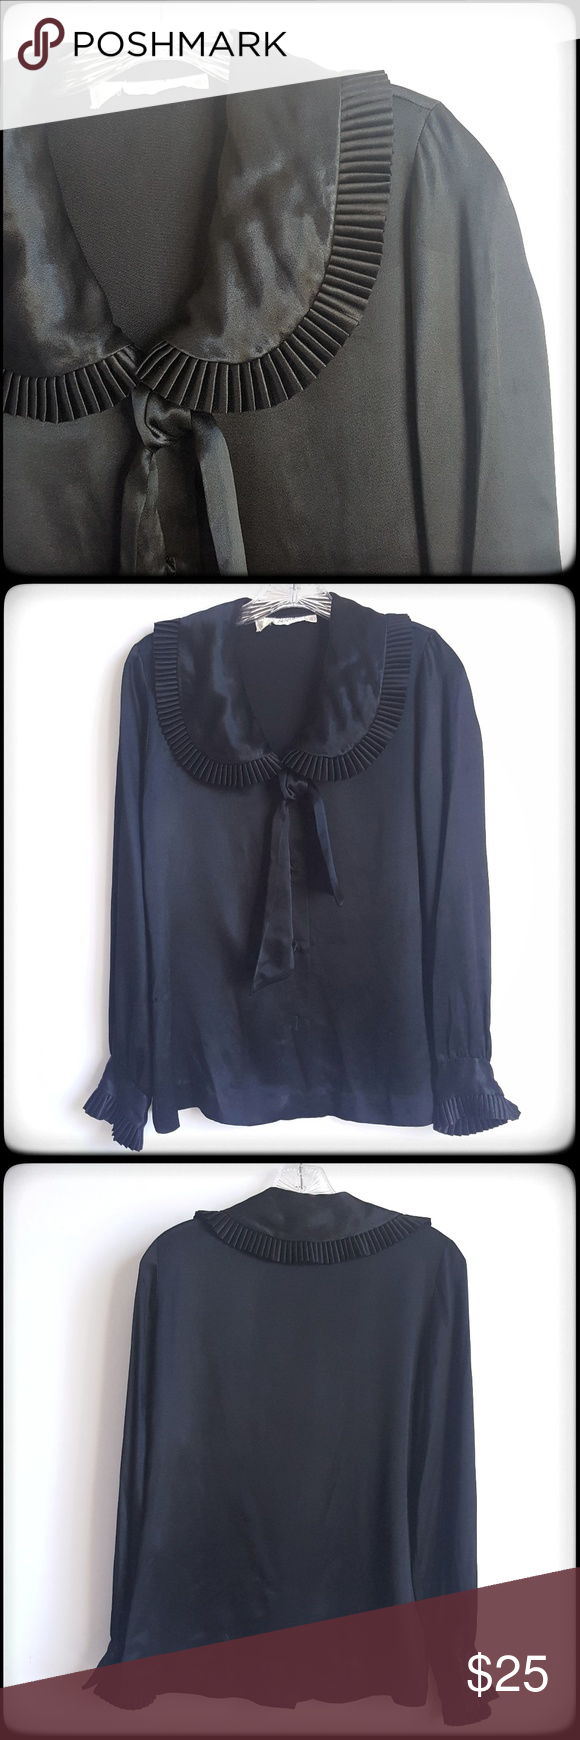 Vintage long sleeve ruffle collar blouse euc my posh picks